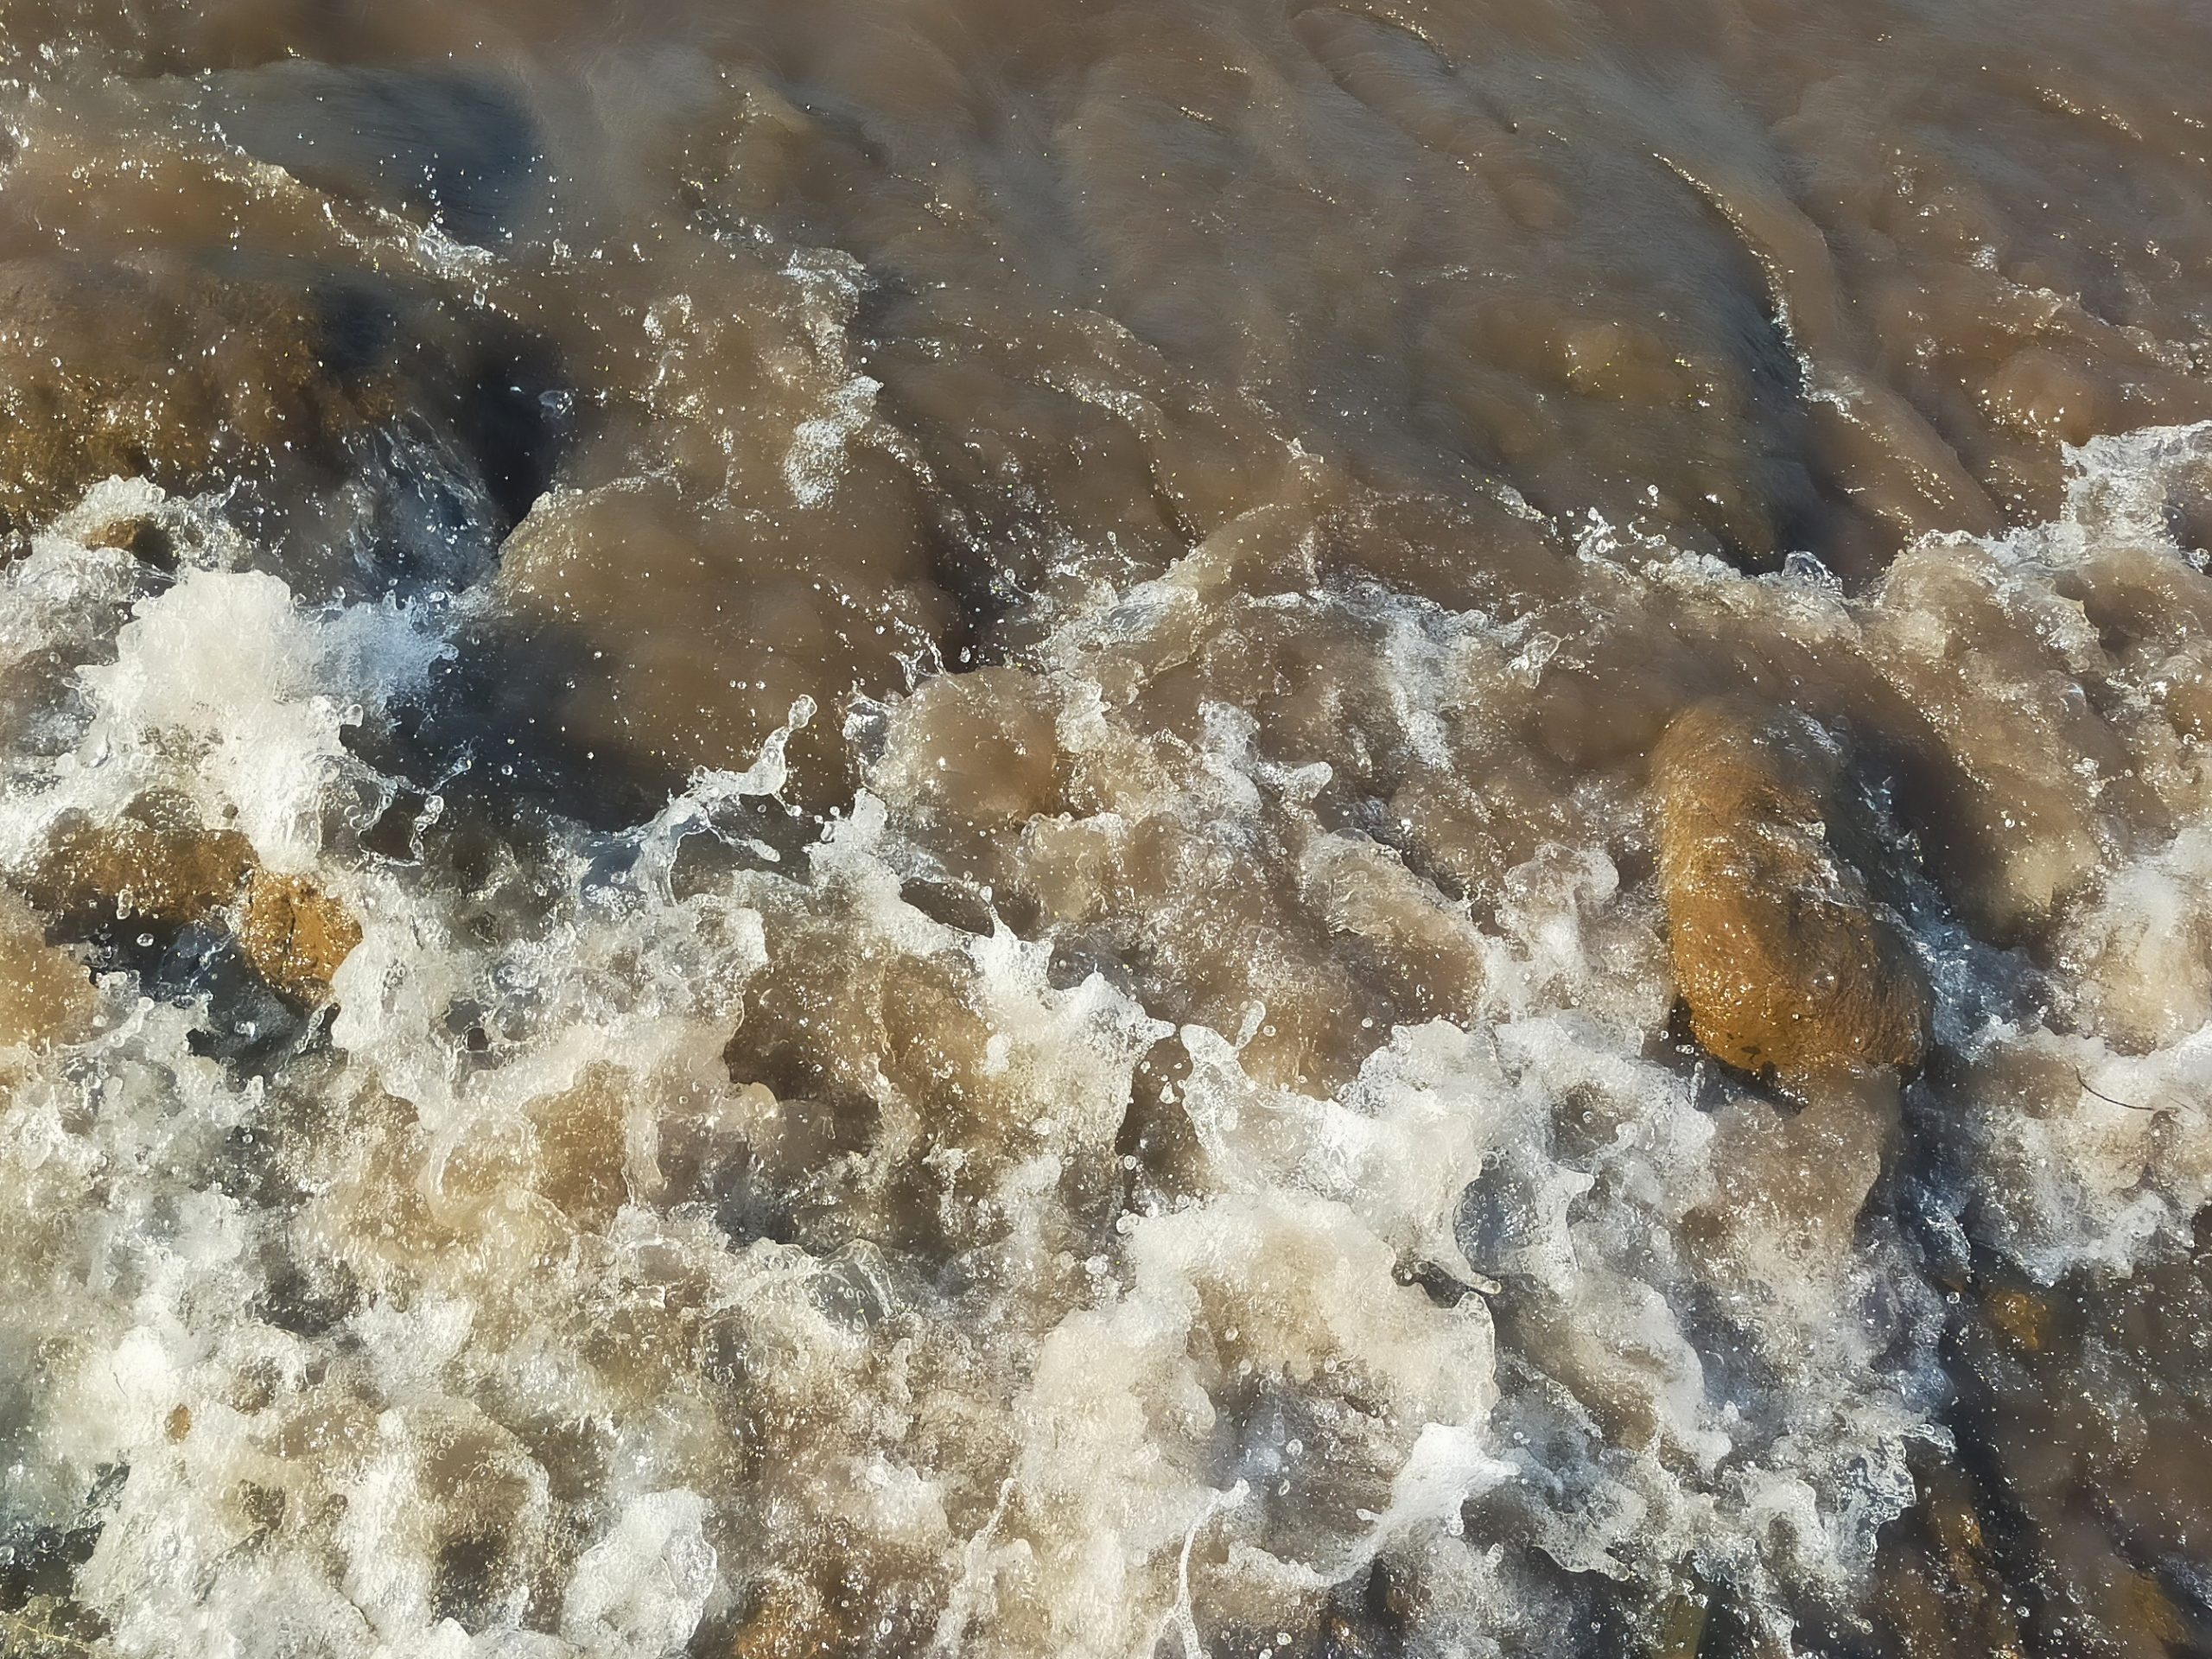 Water waves and splash